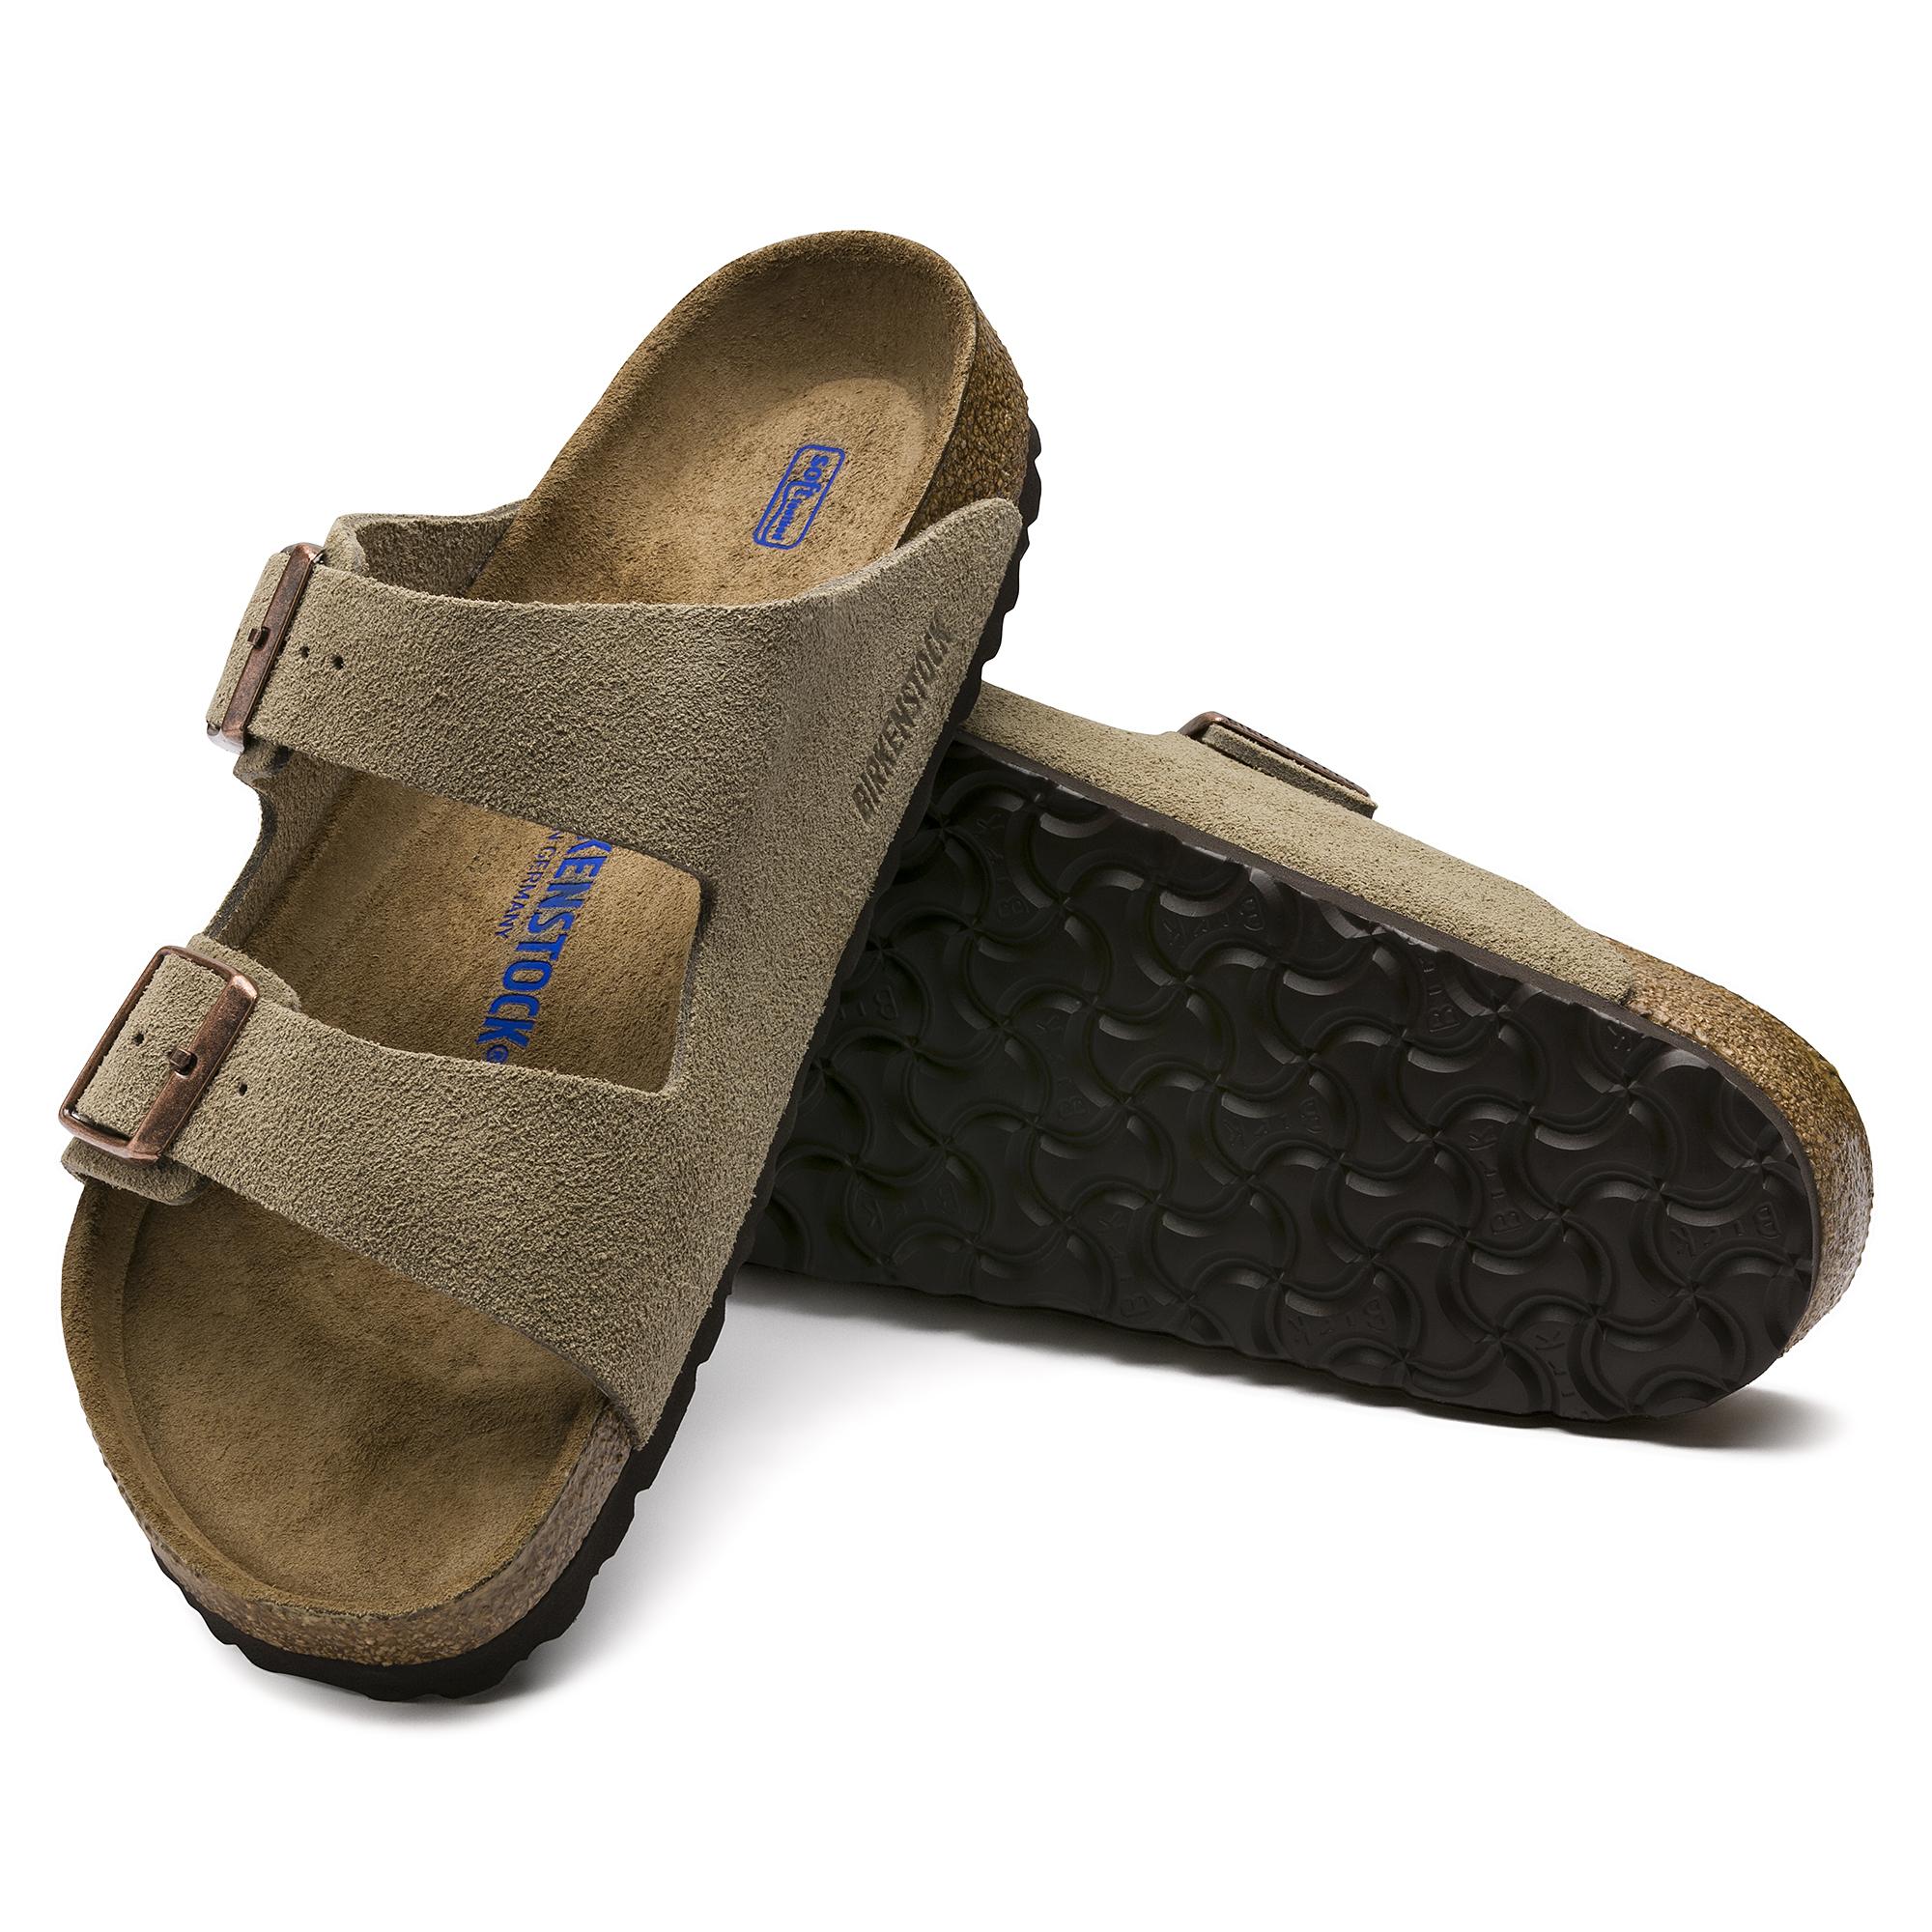 BIRKENSTOCK ARIZONA TAUPE Suede Two Strap Sandal Size 41